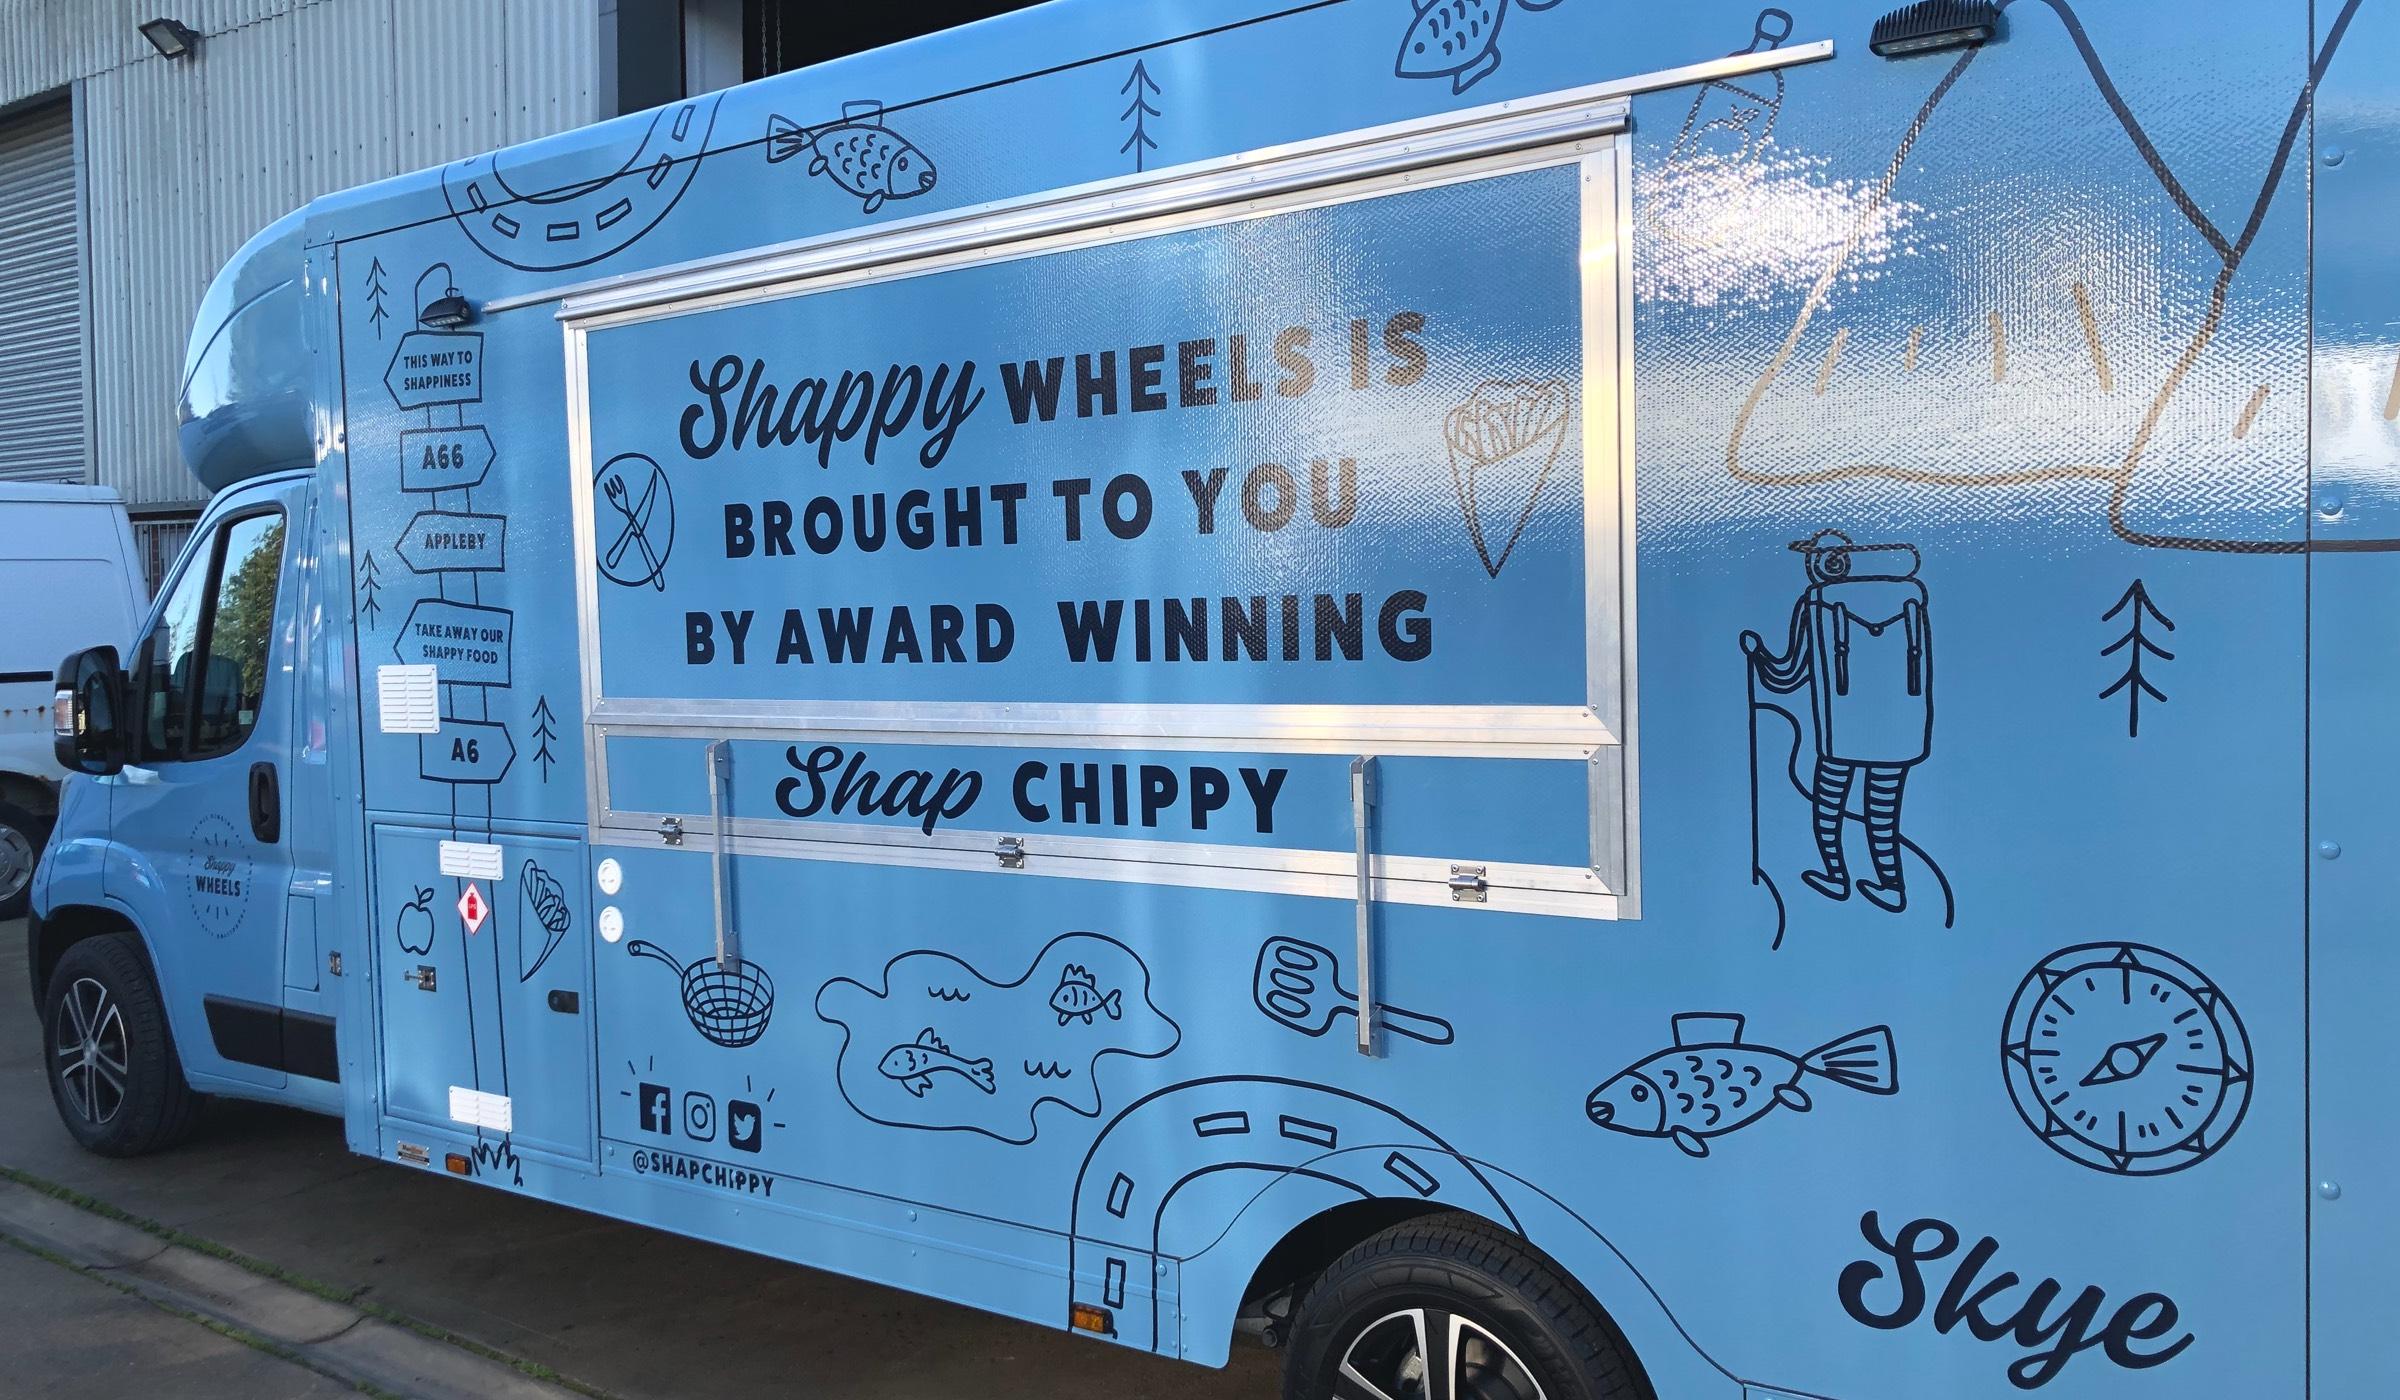 shappy wheels